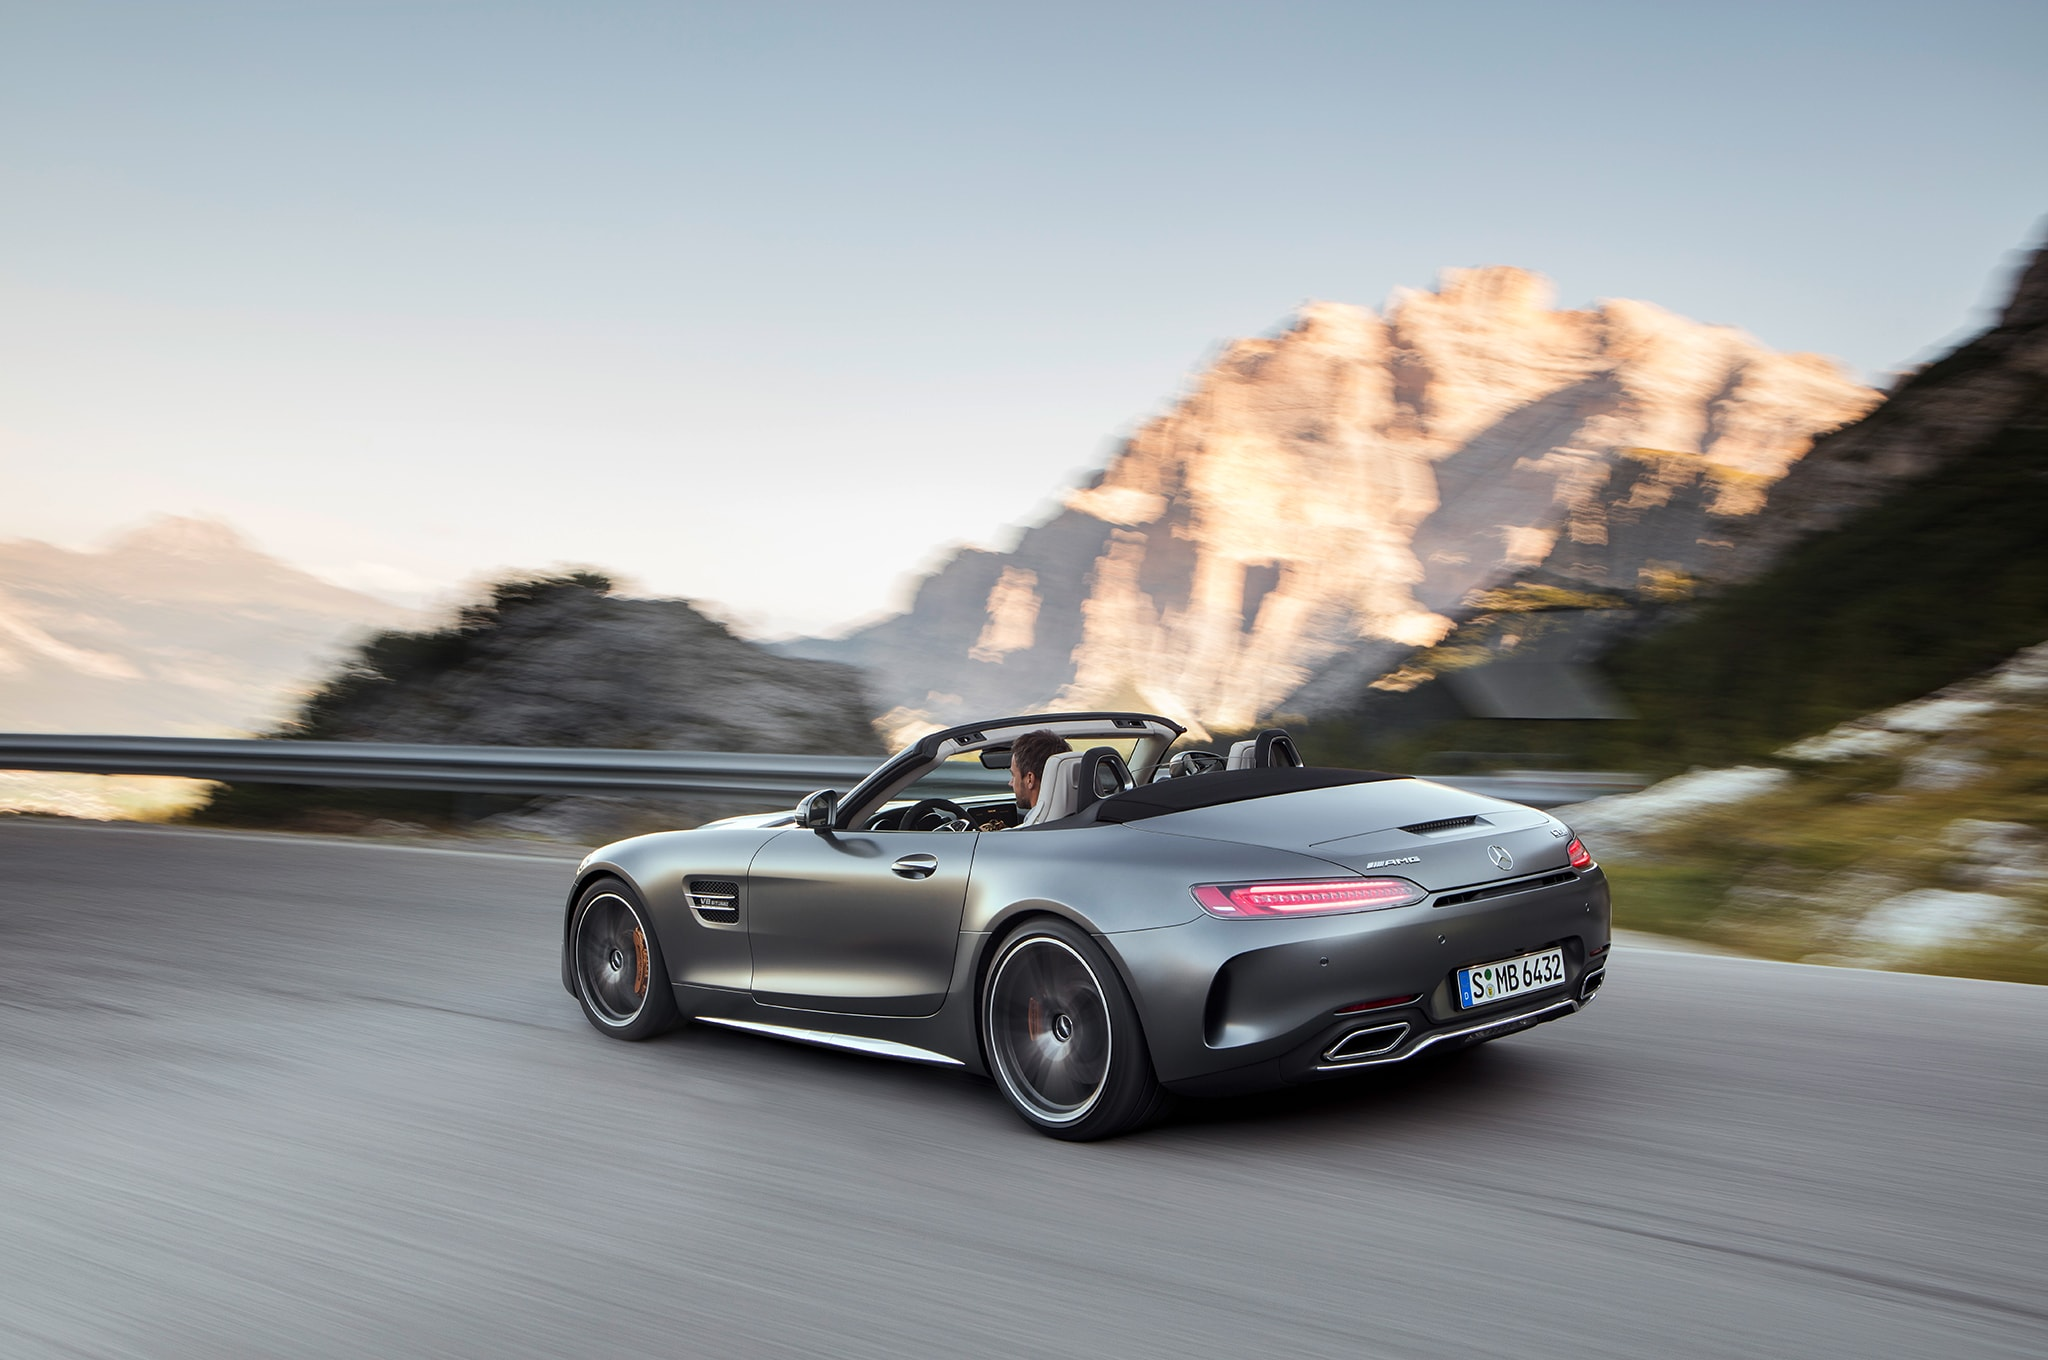 Mercedes-AMG GT Roadster Backgrounds